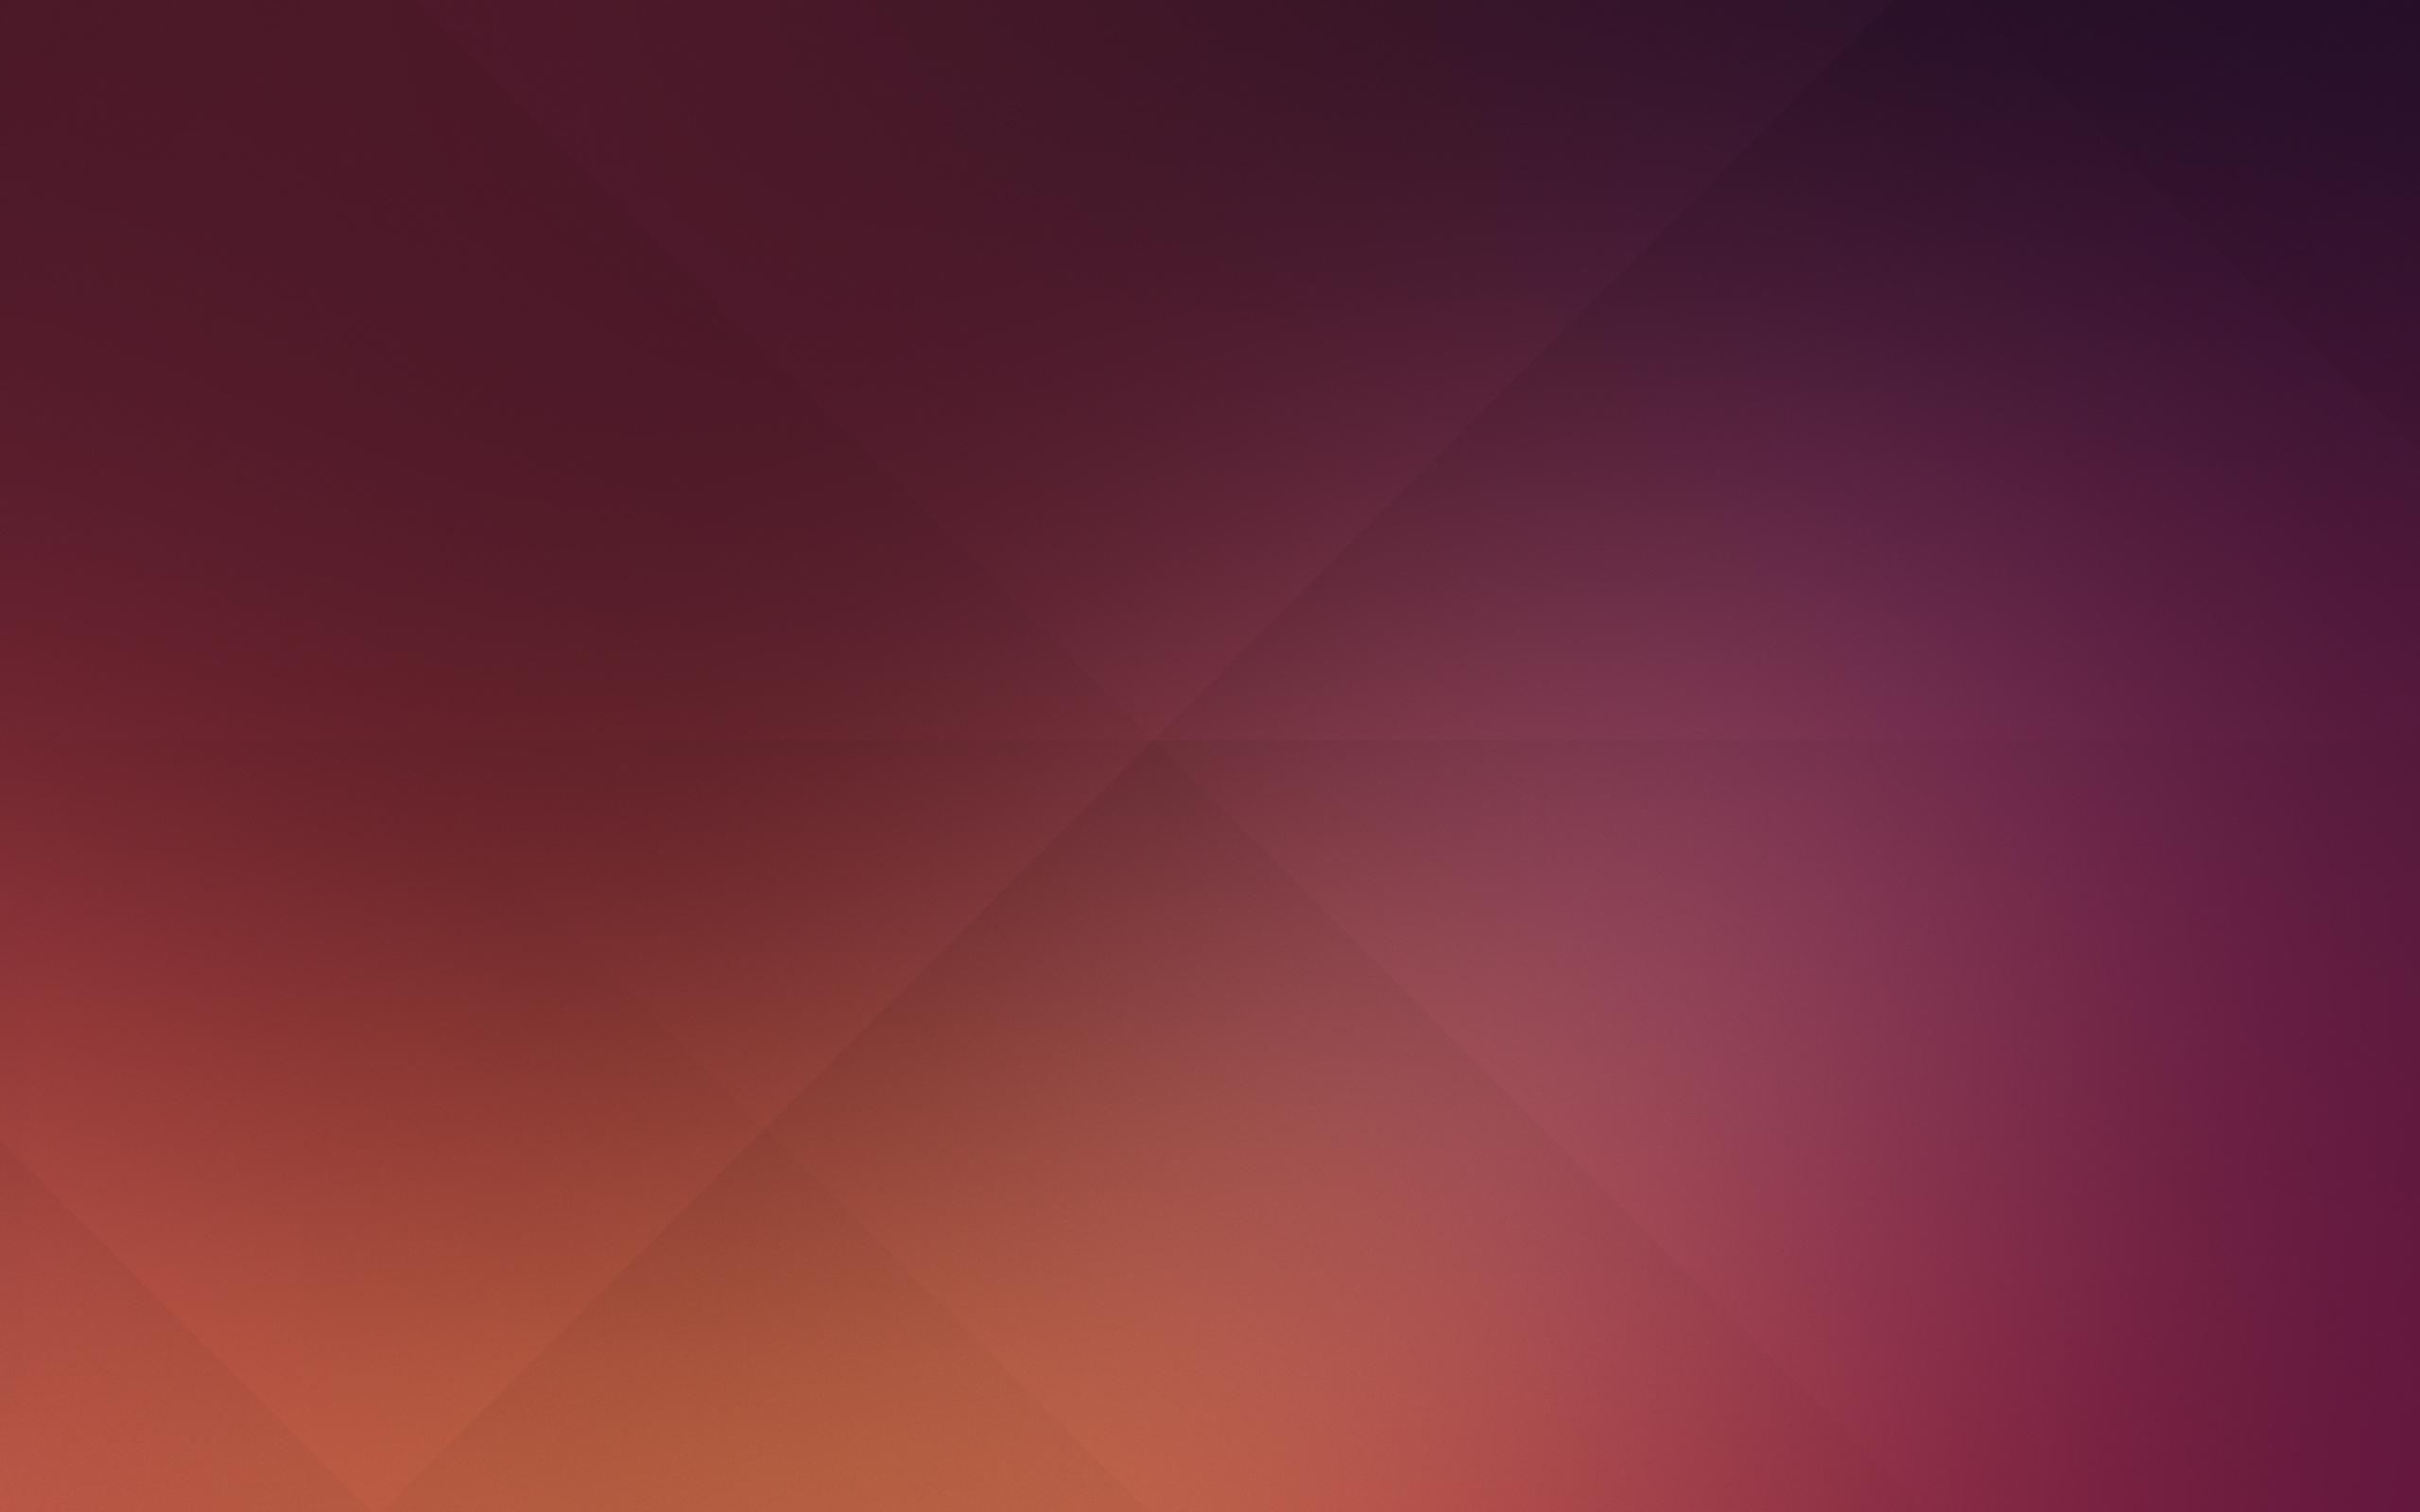 ubuntu pink and black - photo #7